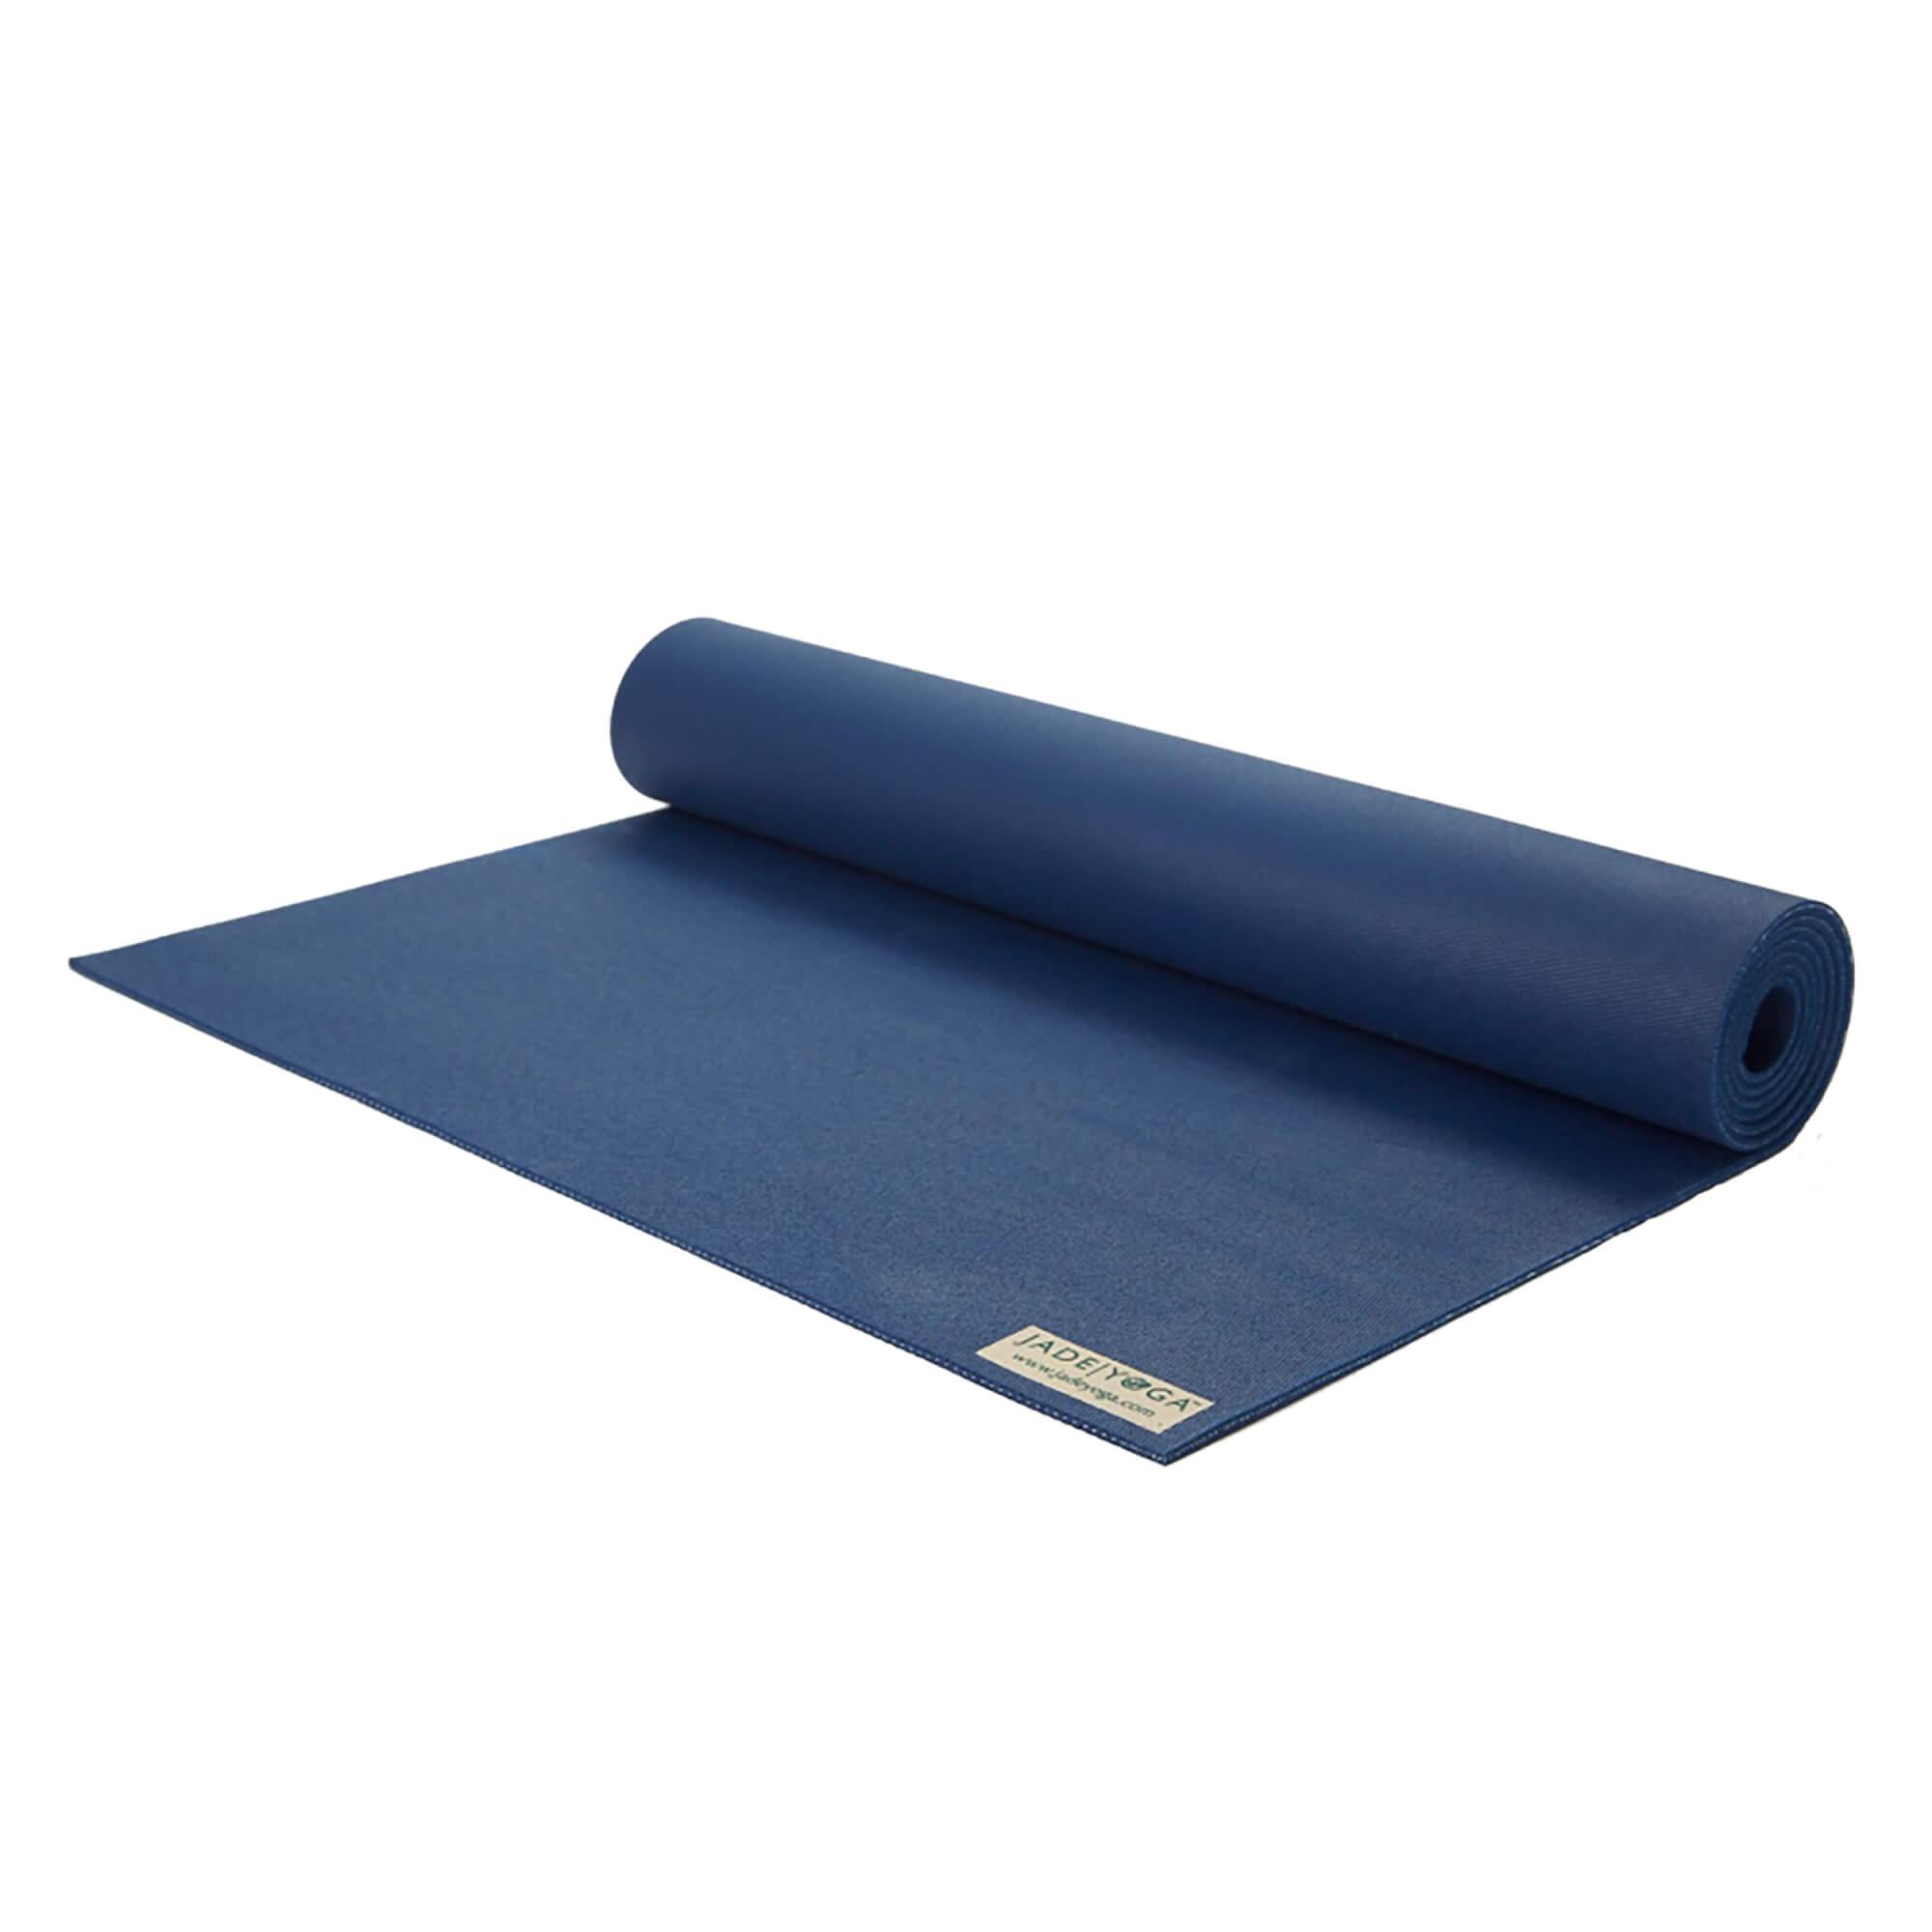 Коврик для йоги Jade Travel 3 мм из каучука (1.4 кг, 173 см, 3 мм, темно-синий, 60 см) цена